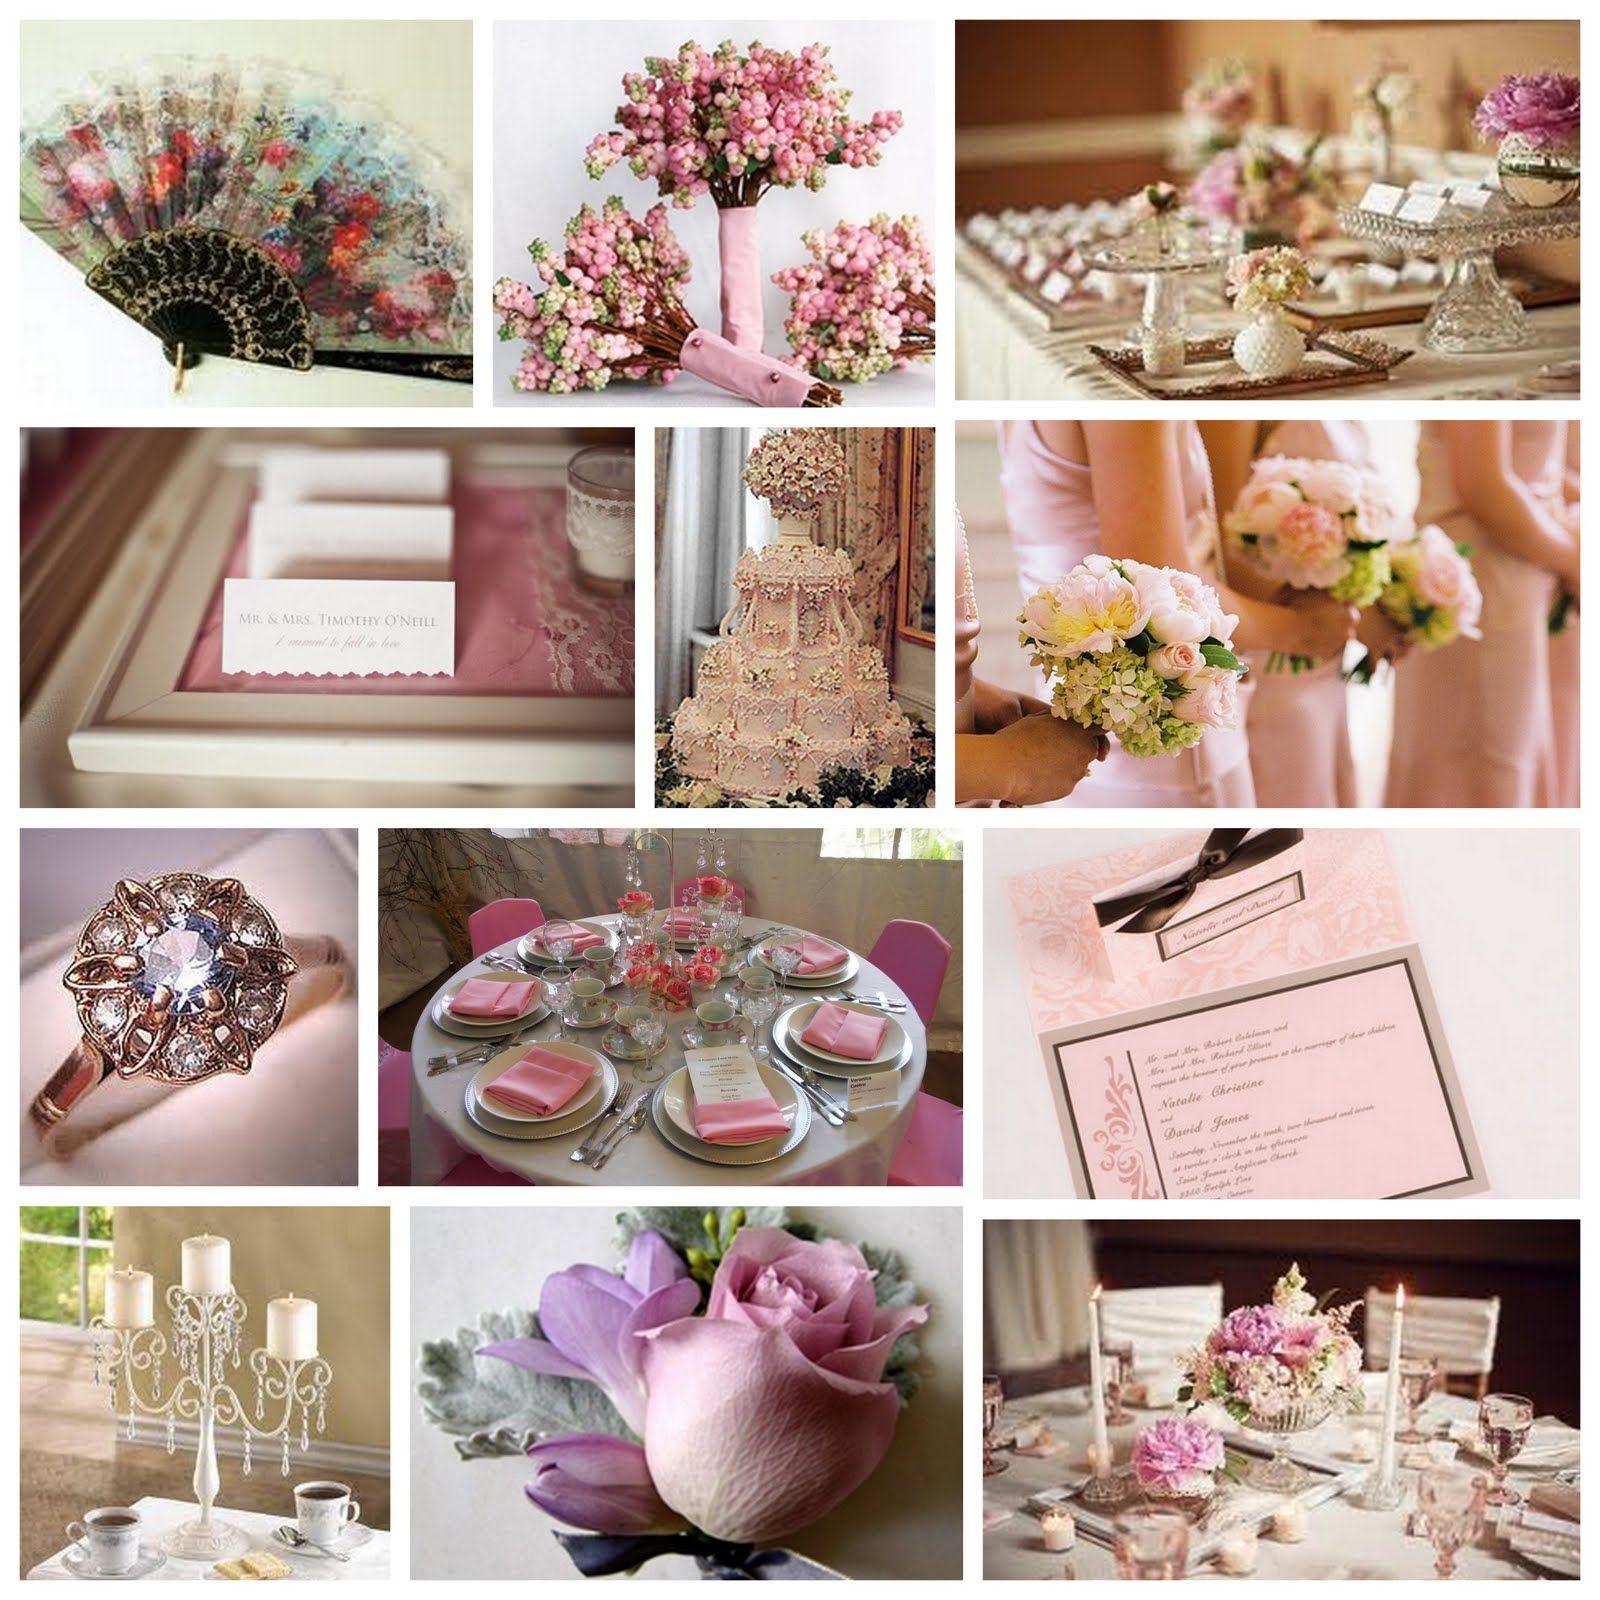 pinnana on victorian reception themes | wedding themes